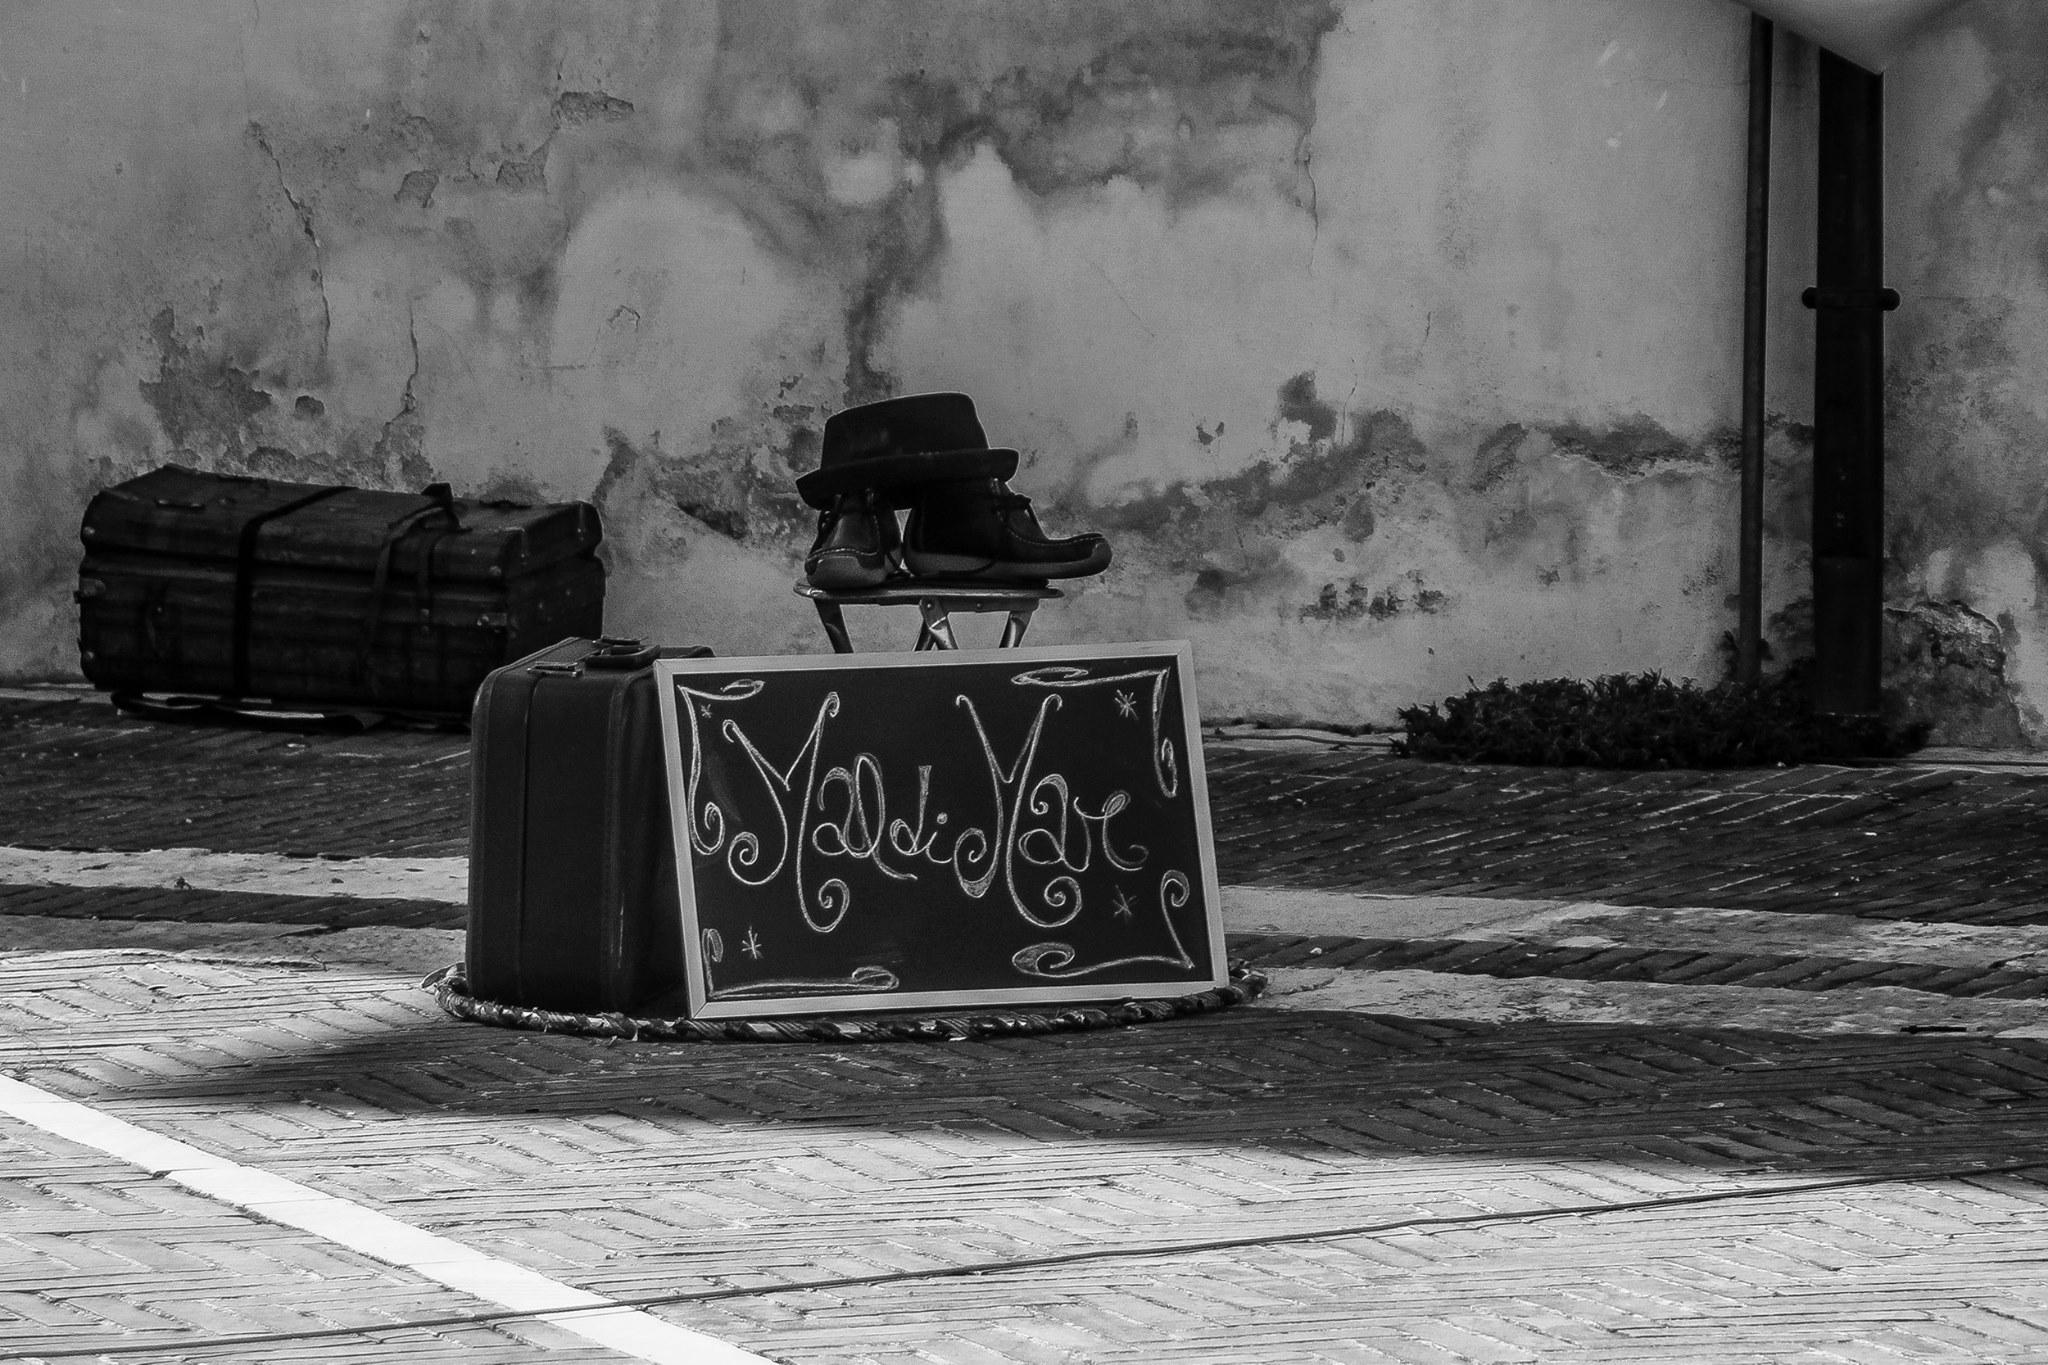 artista di strada a cappello acrobat